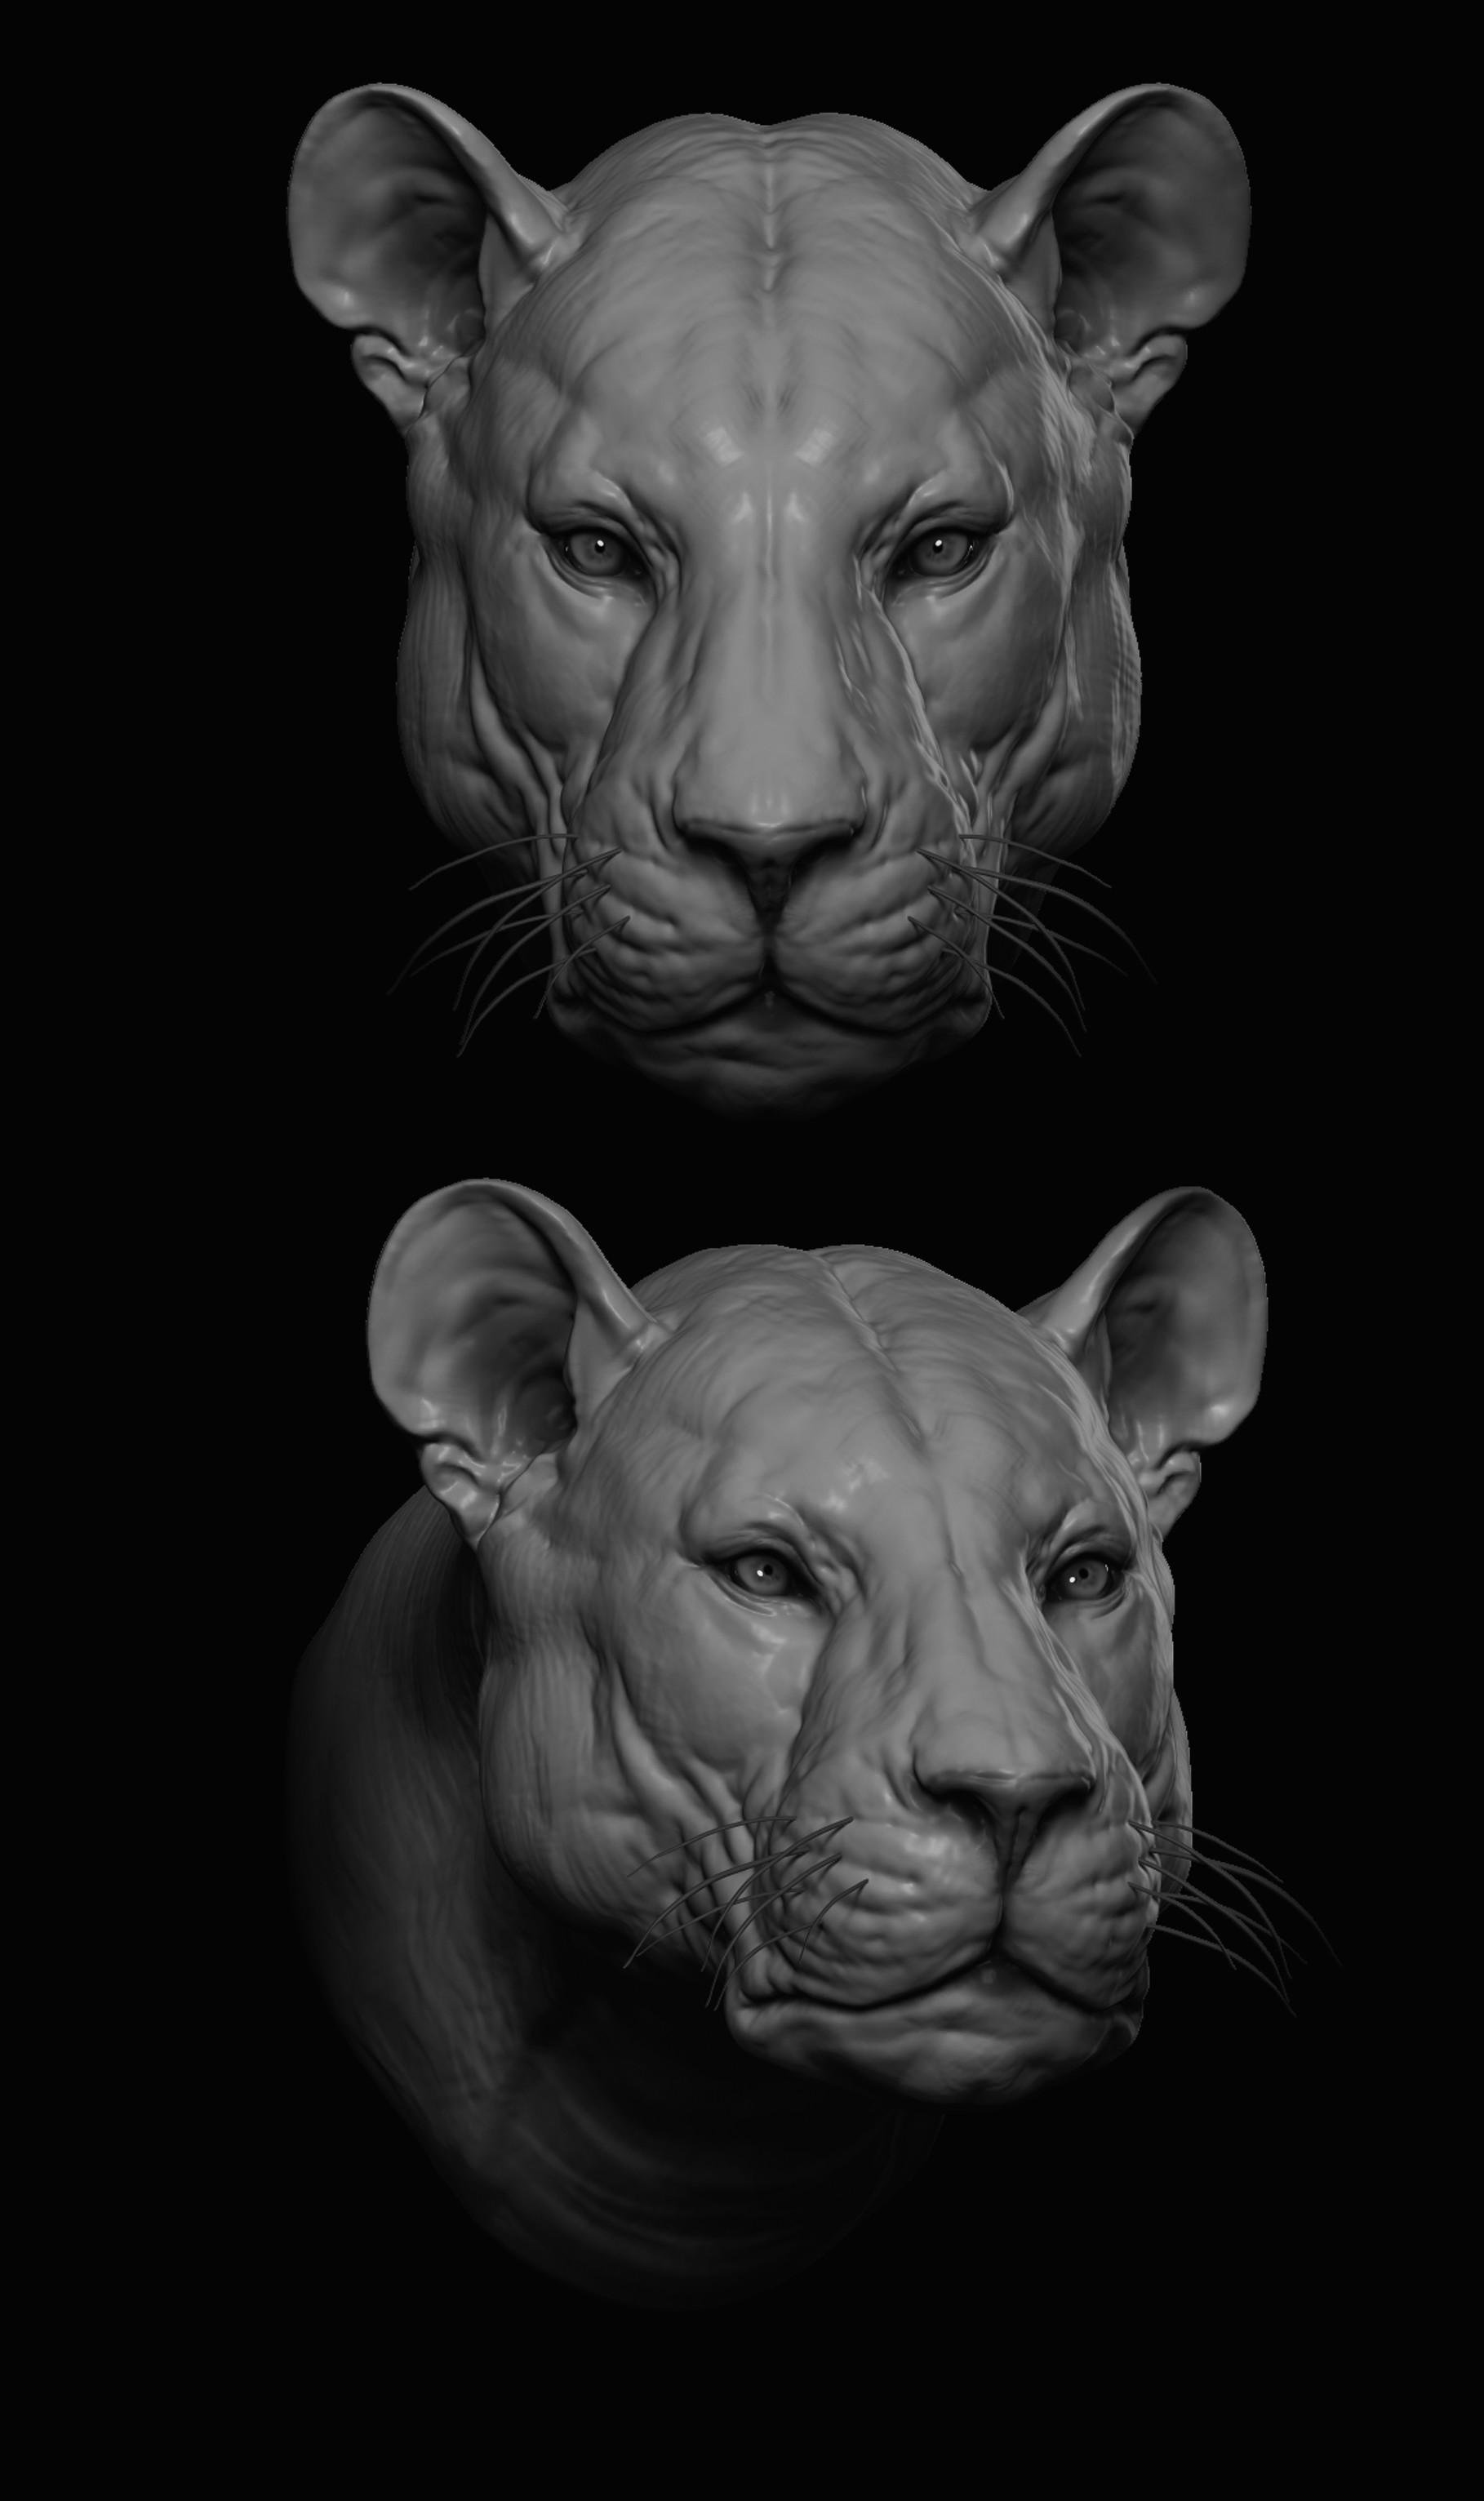 Antonio esparza lion1